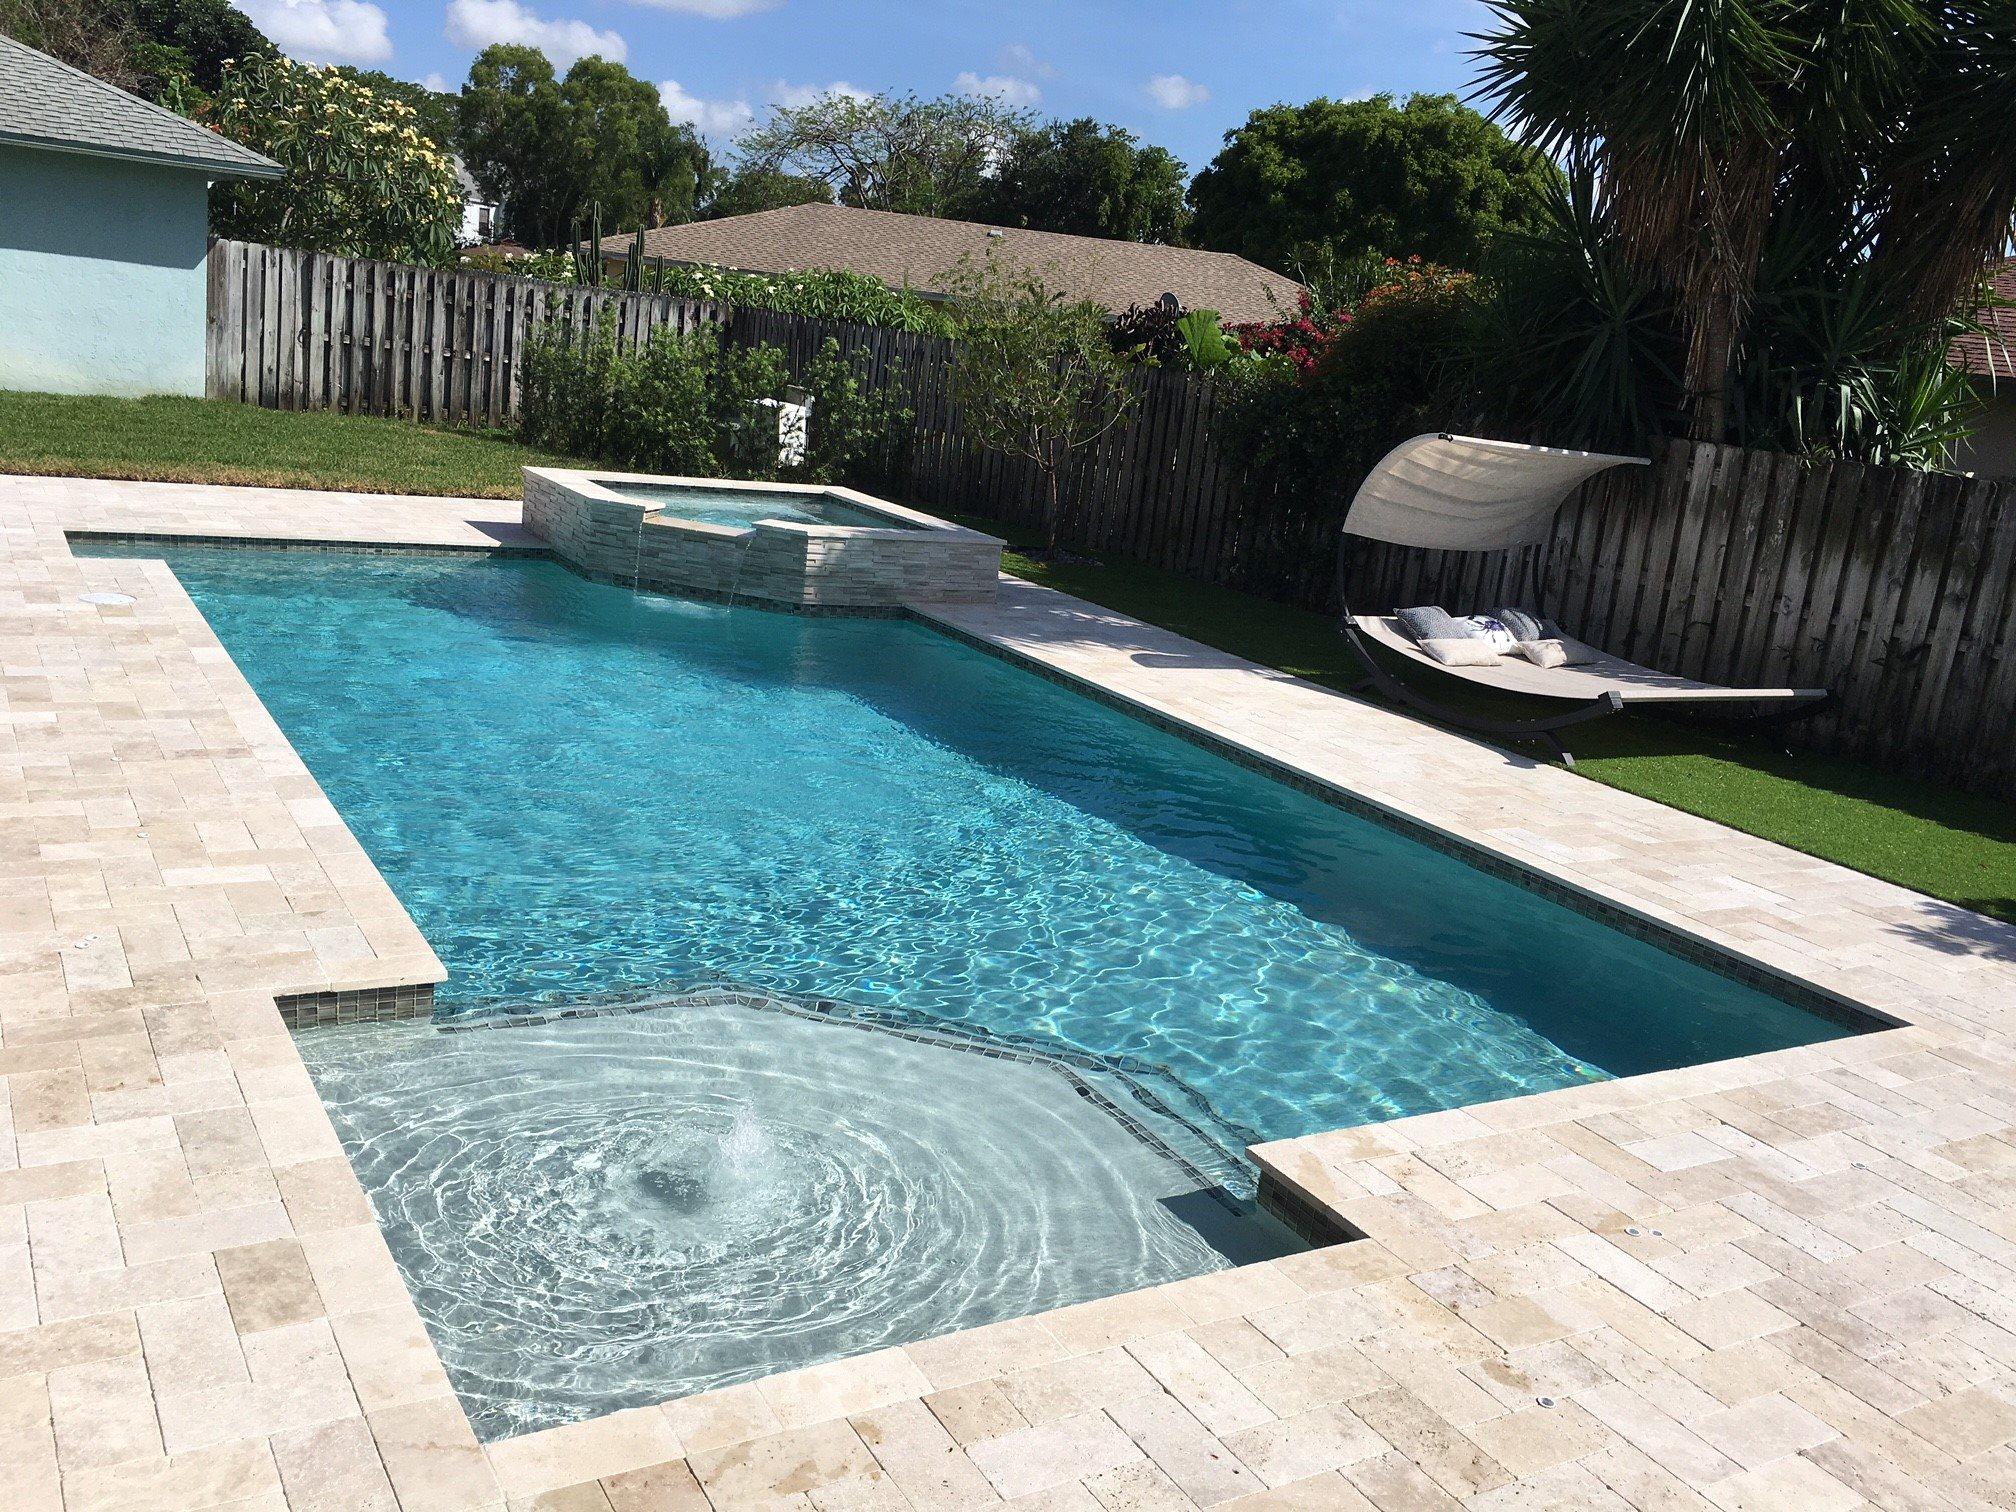 Sunsational Pools & Spas - Loxahatchee Wheelchairs